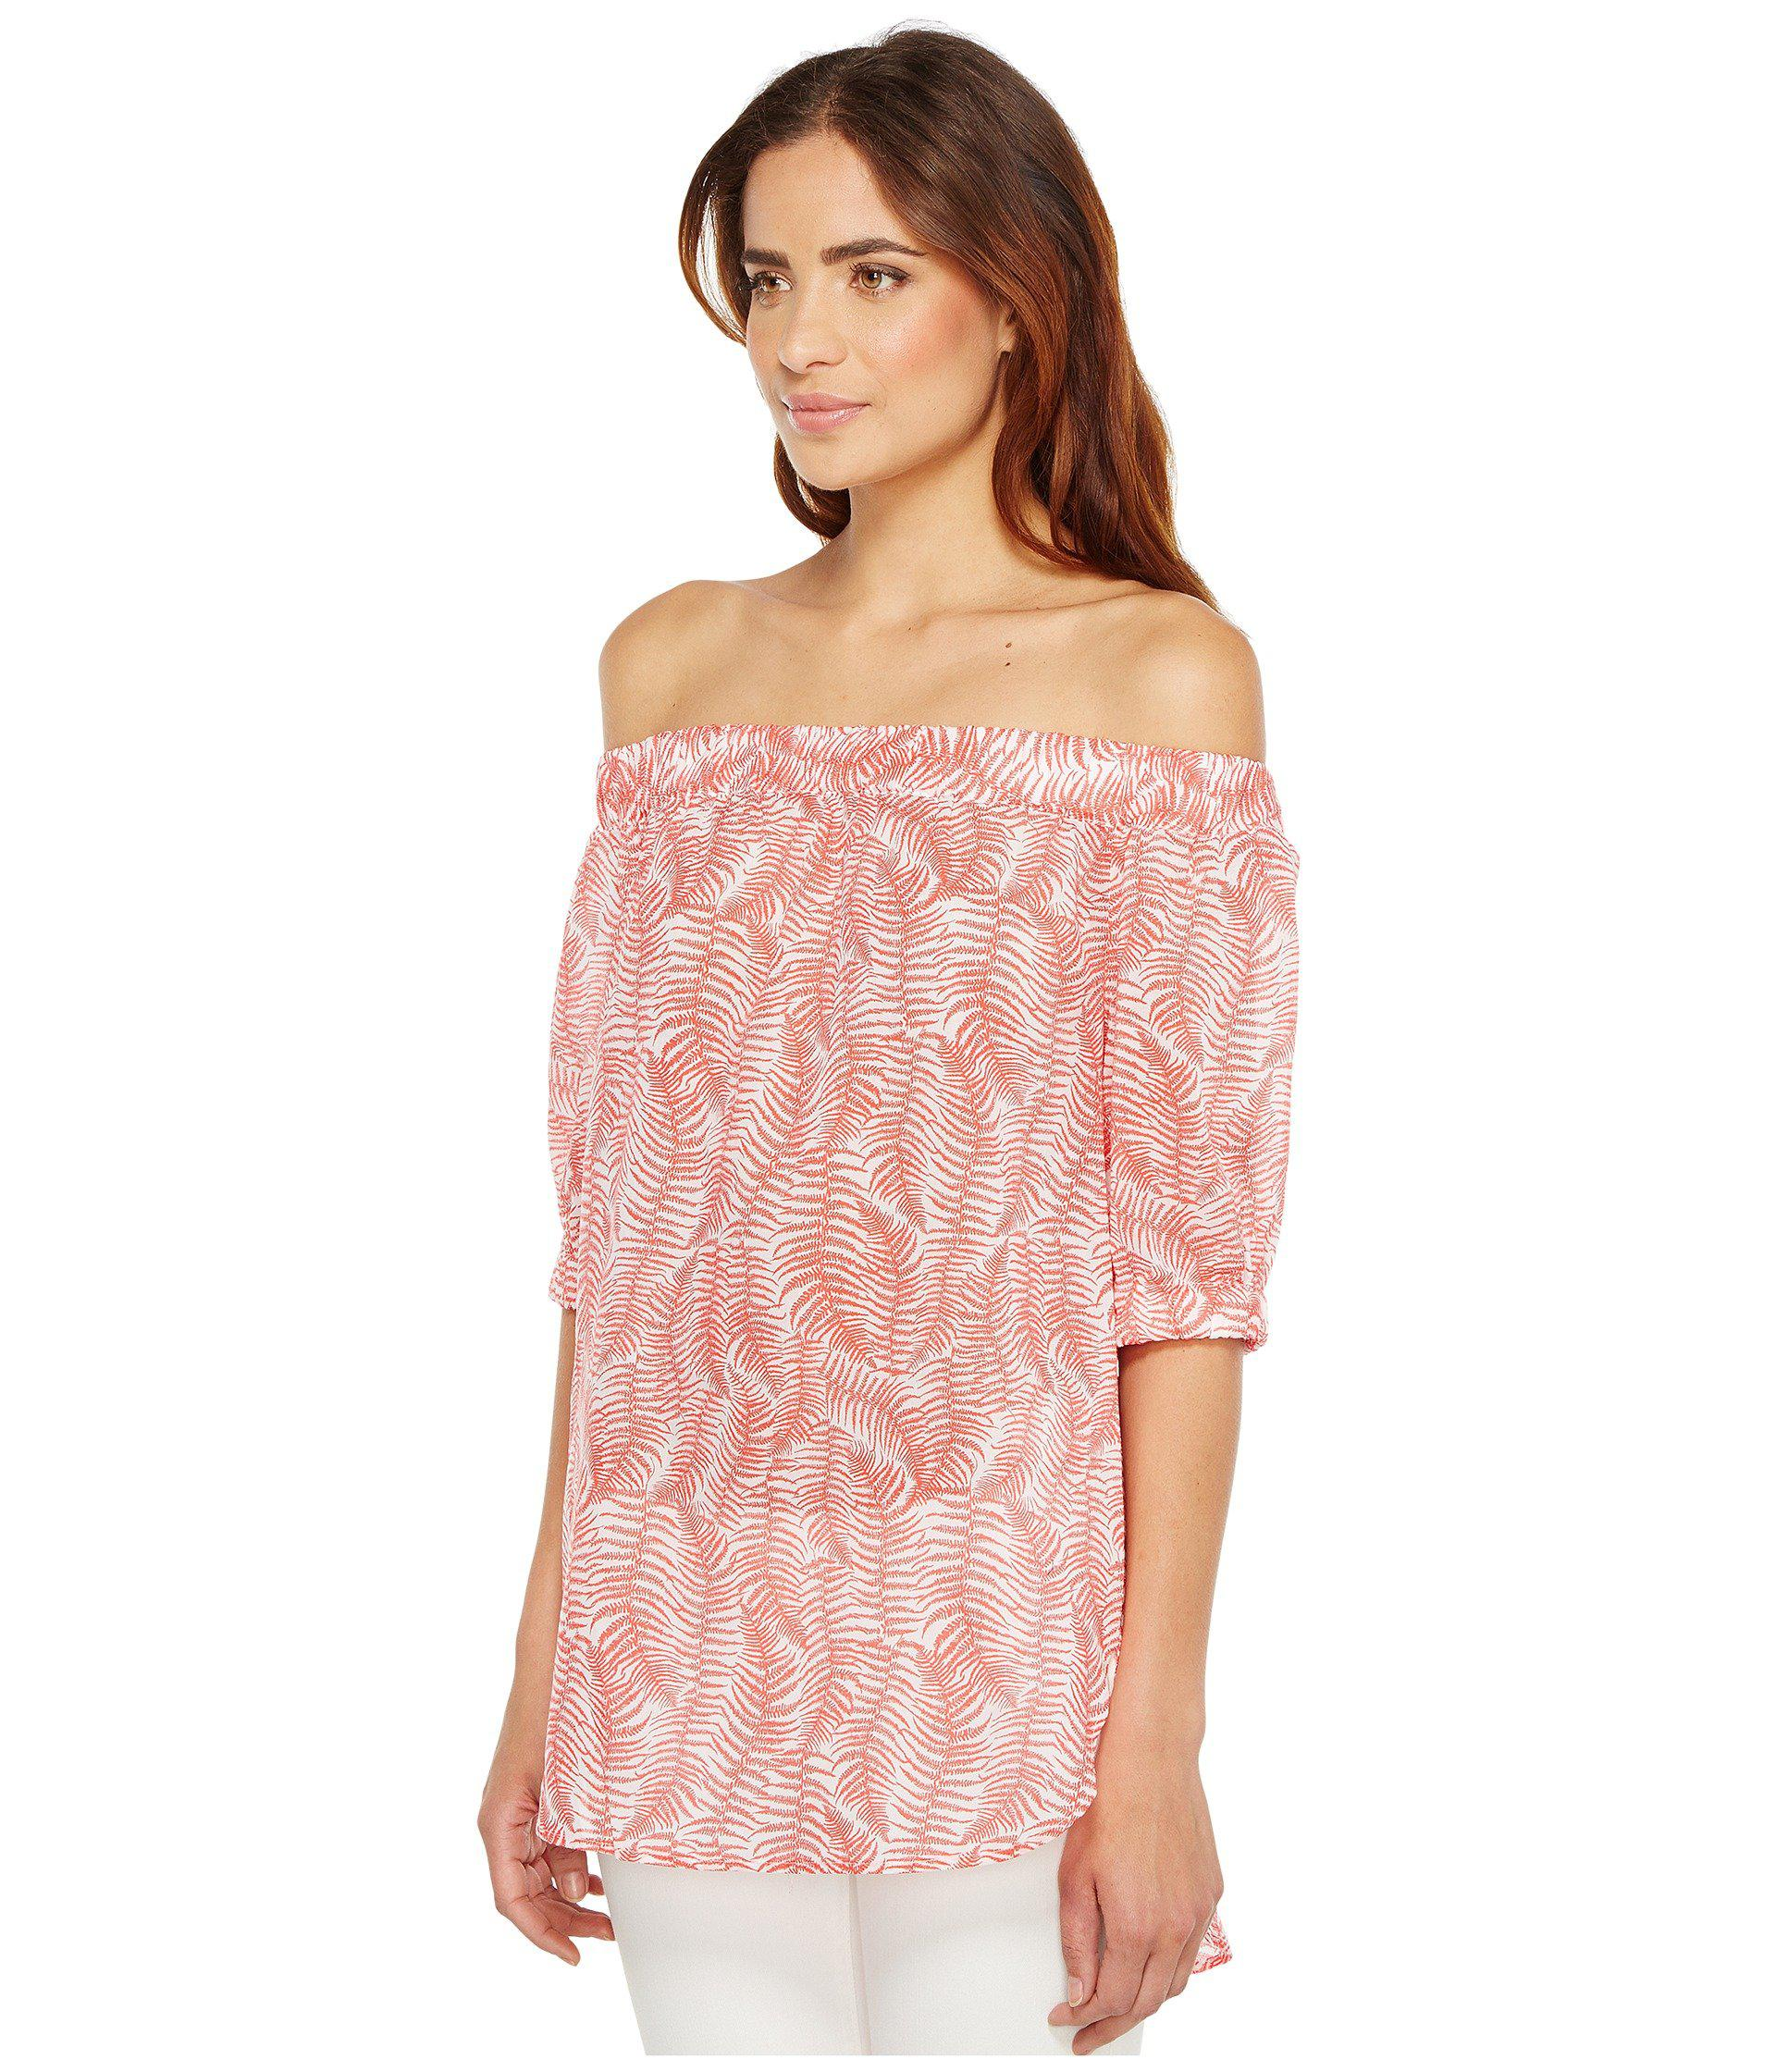 afc833f5045b8 Lyst - MICHAEL Michael Kors Pella Fern Off Shoulder Top in Pink